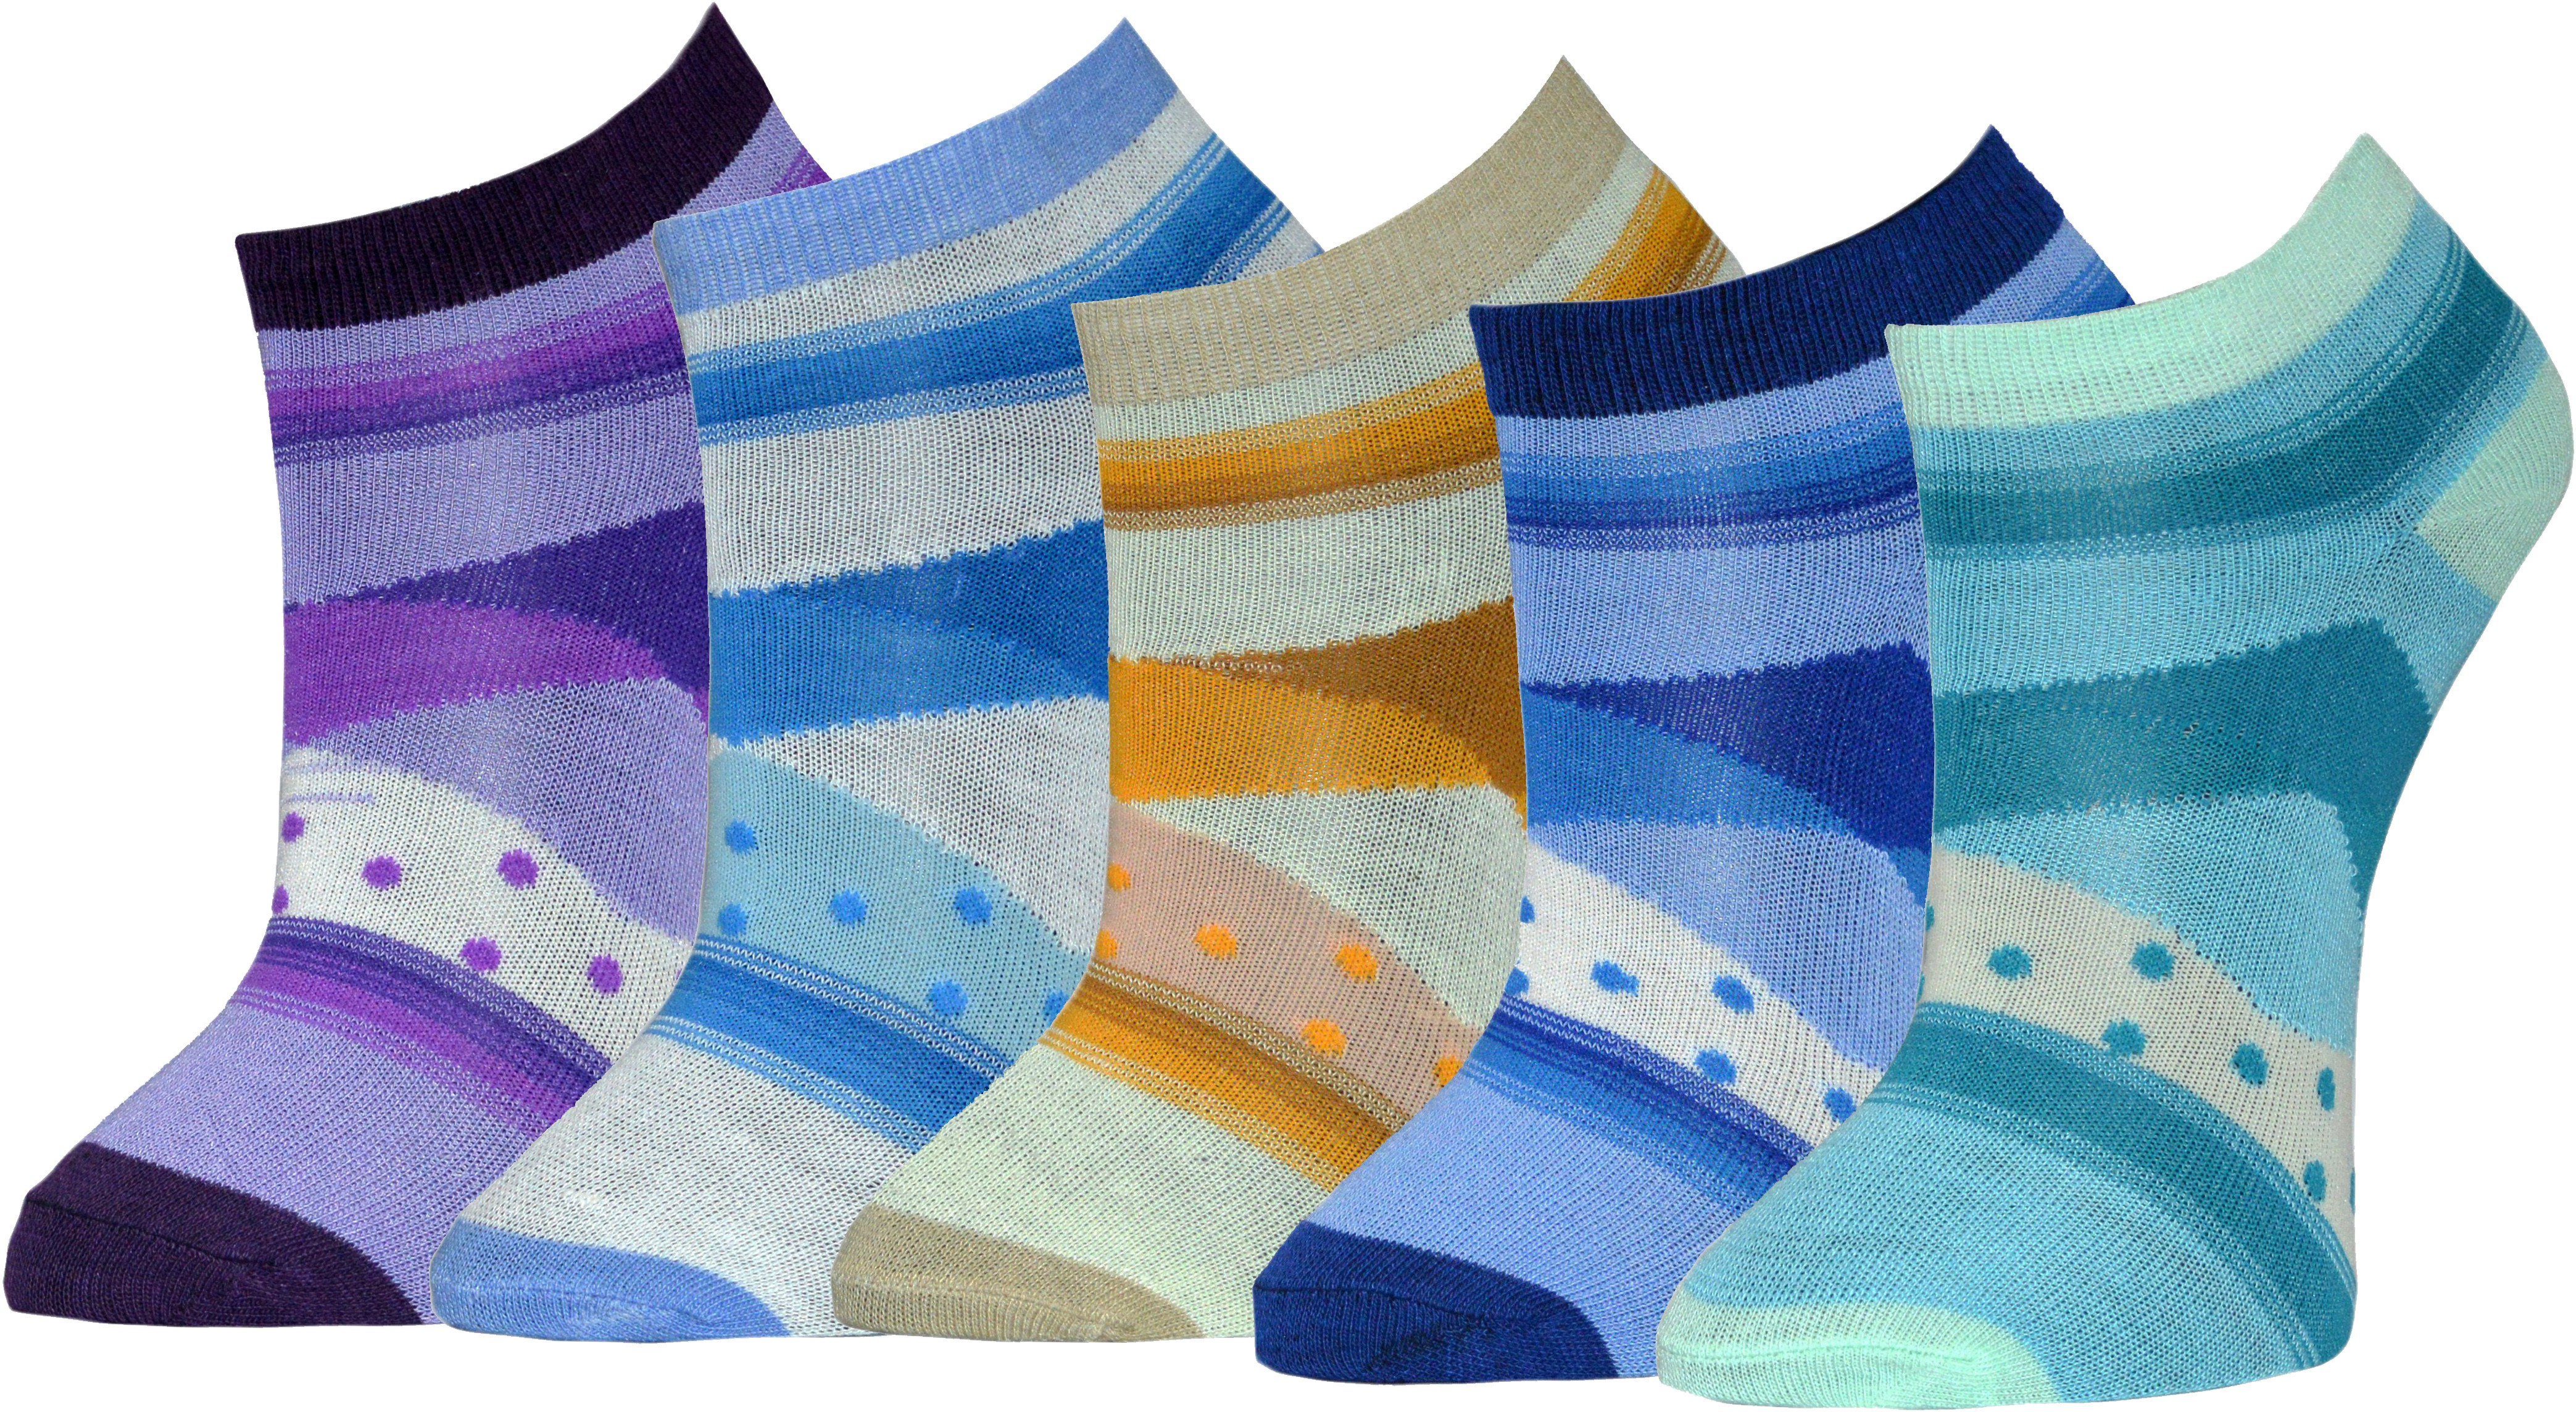 Gen Womens Graphic Print Footie Socks(Pack of 5)